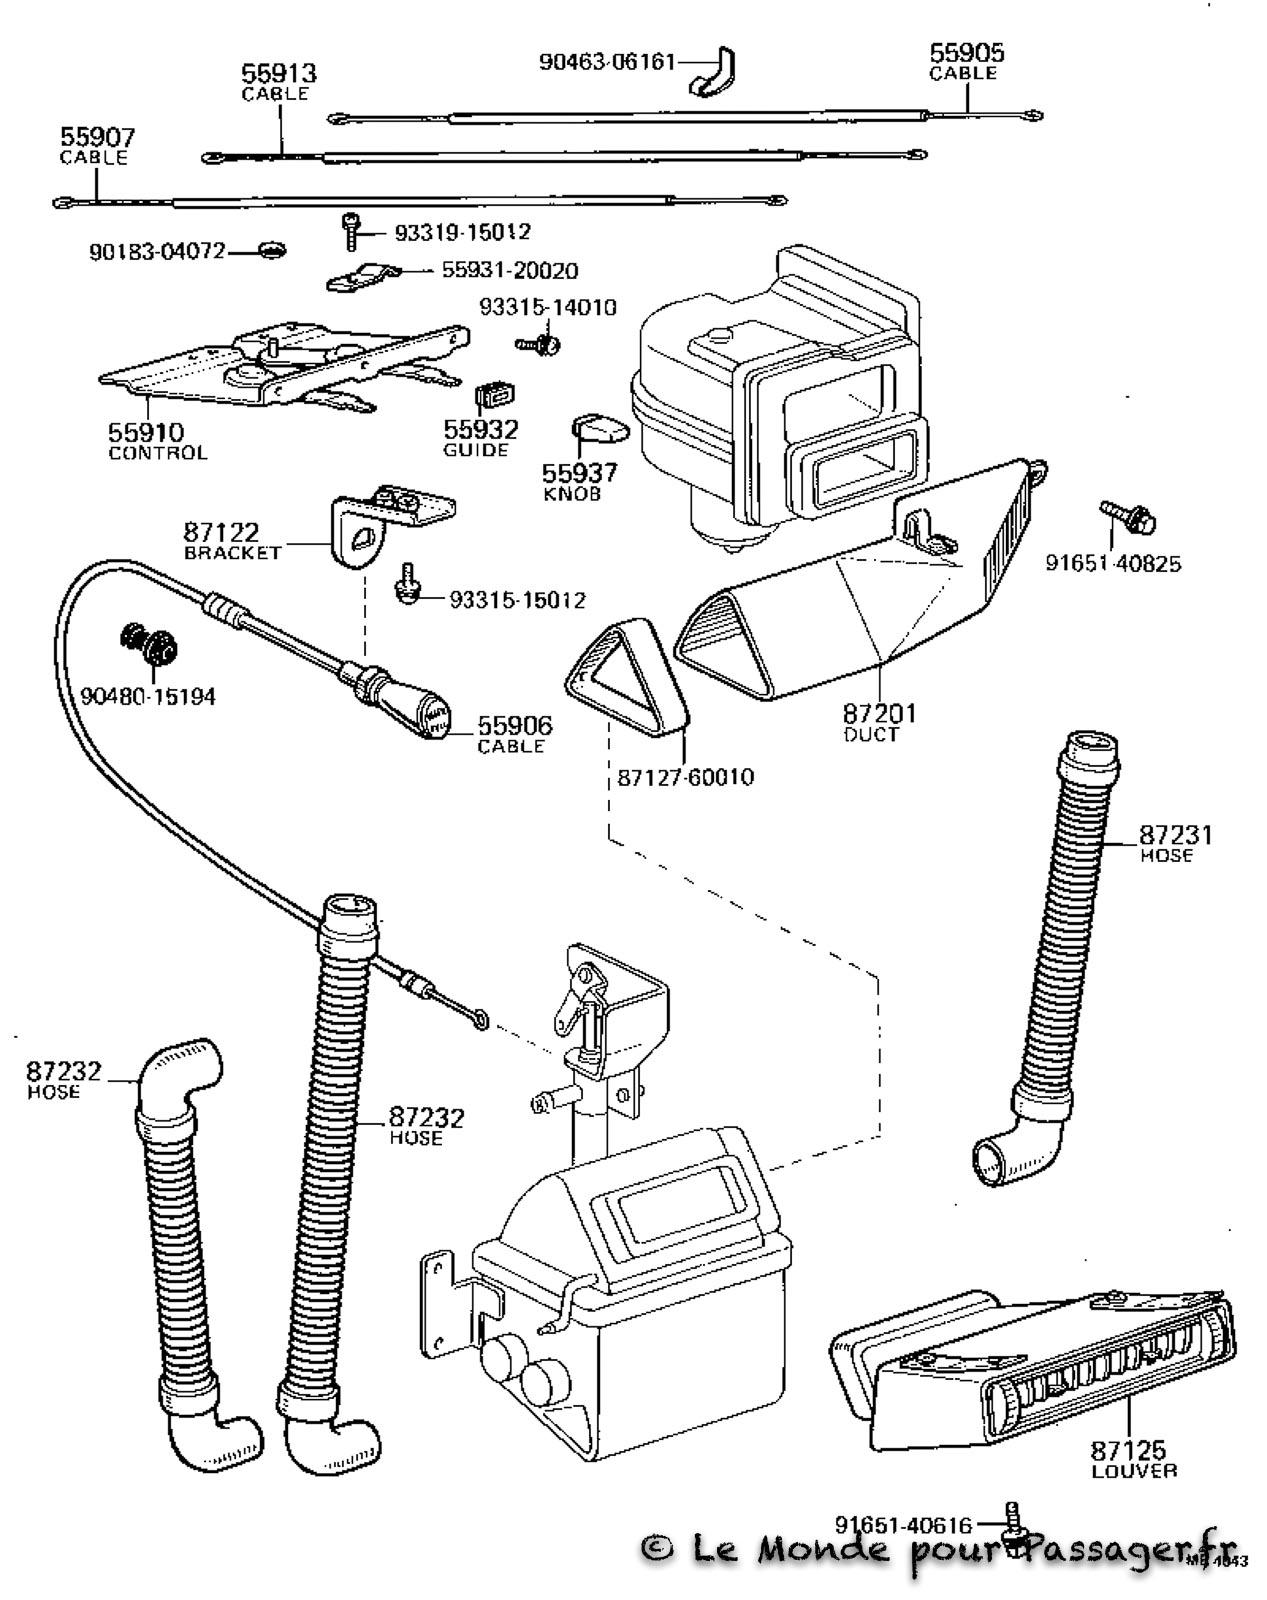 Fj55-Eclatés-Techniques029